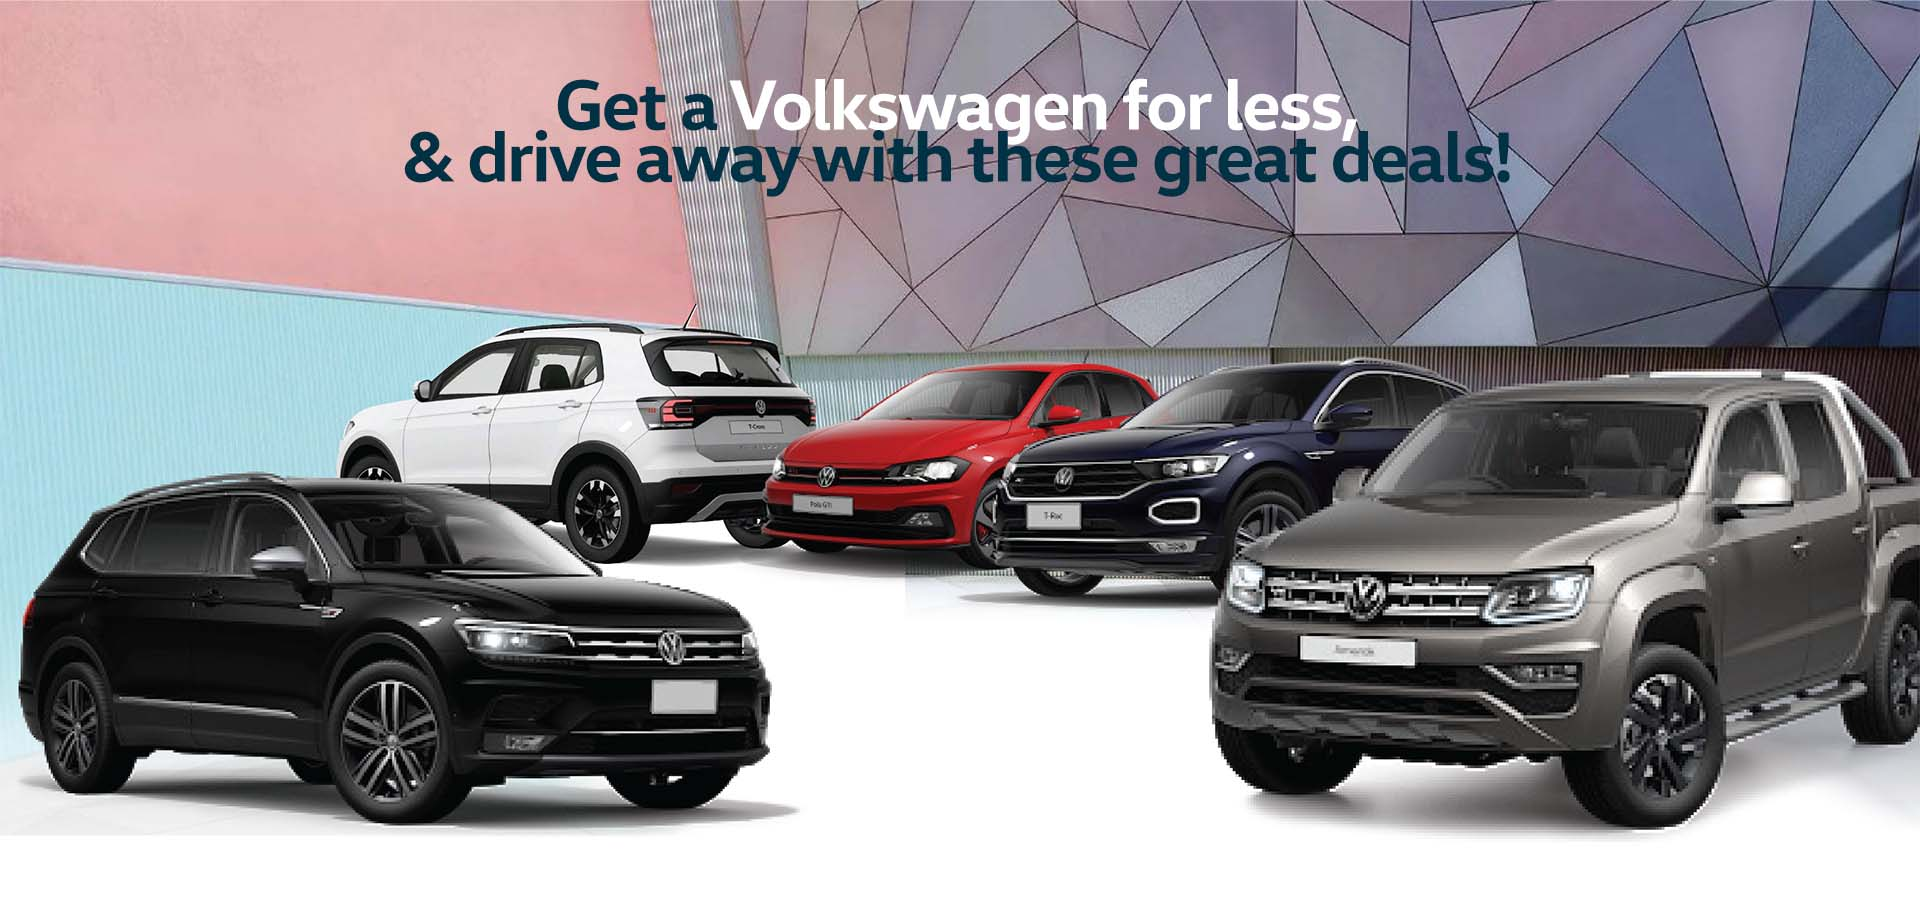 Rockingham Volkswagen-Offer